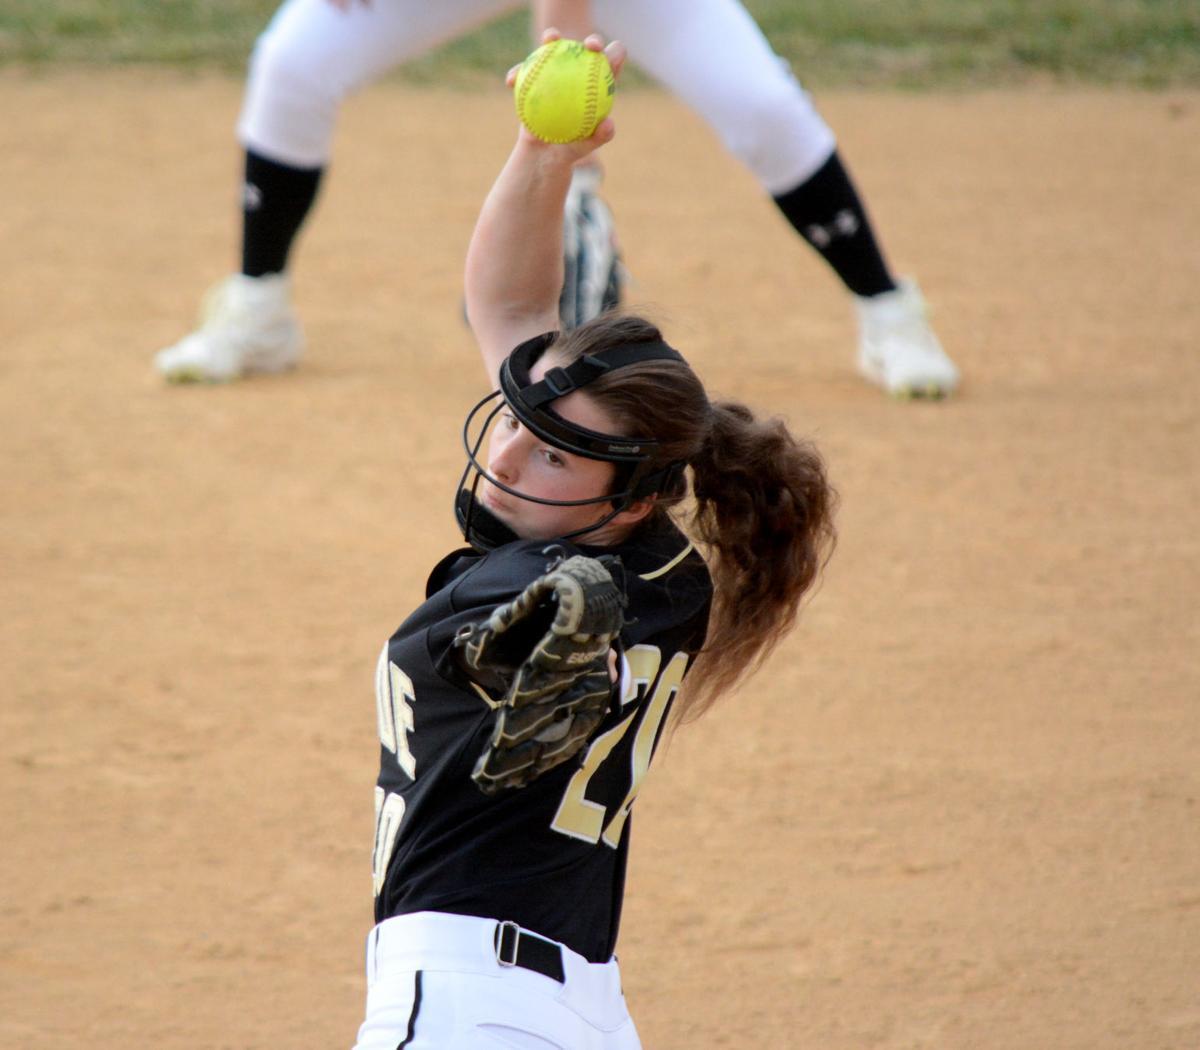 Joslynne Freyer pitching